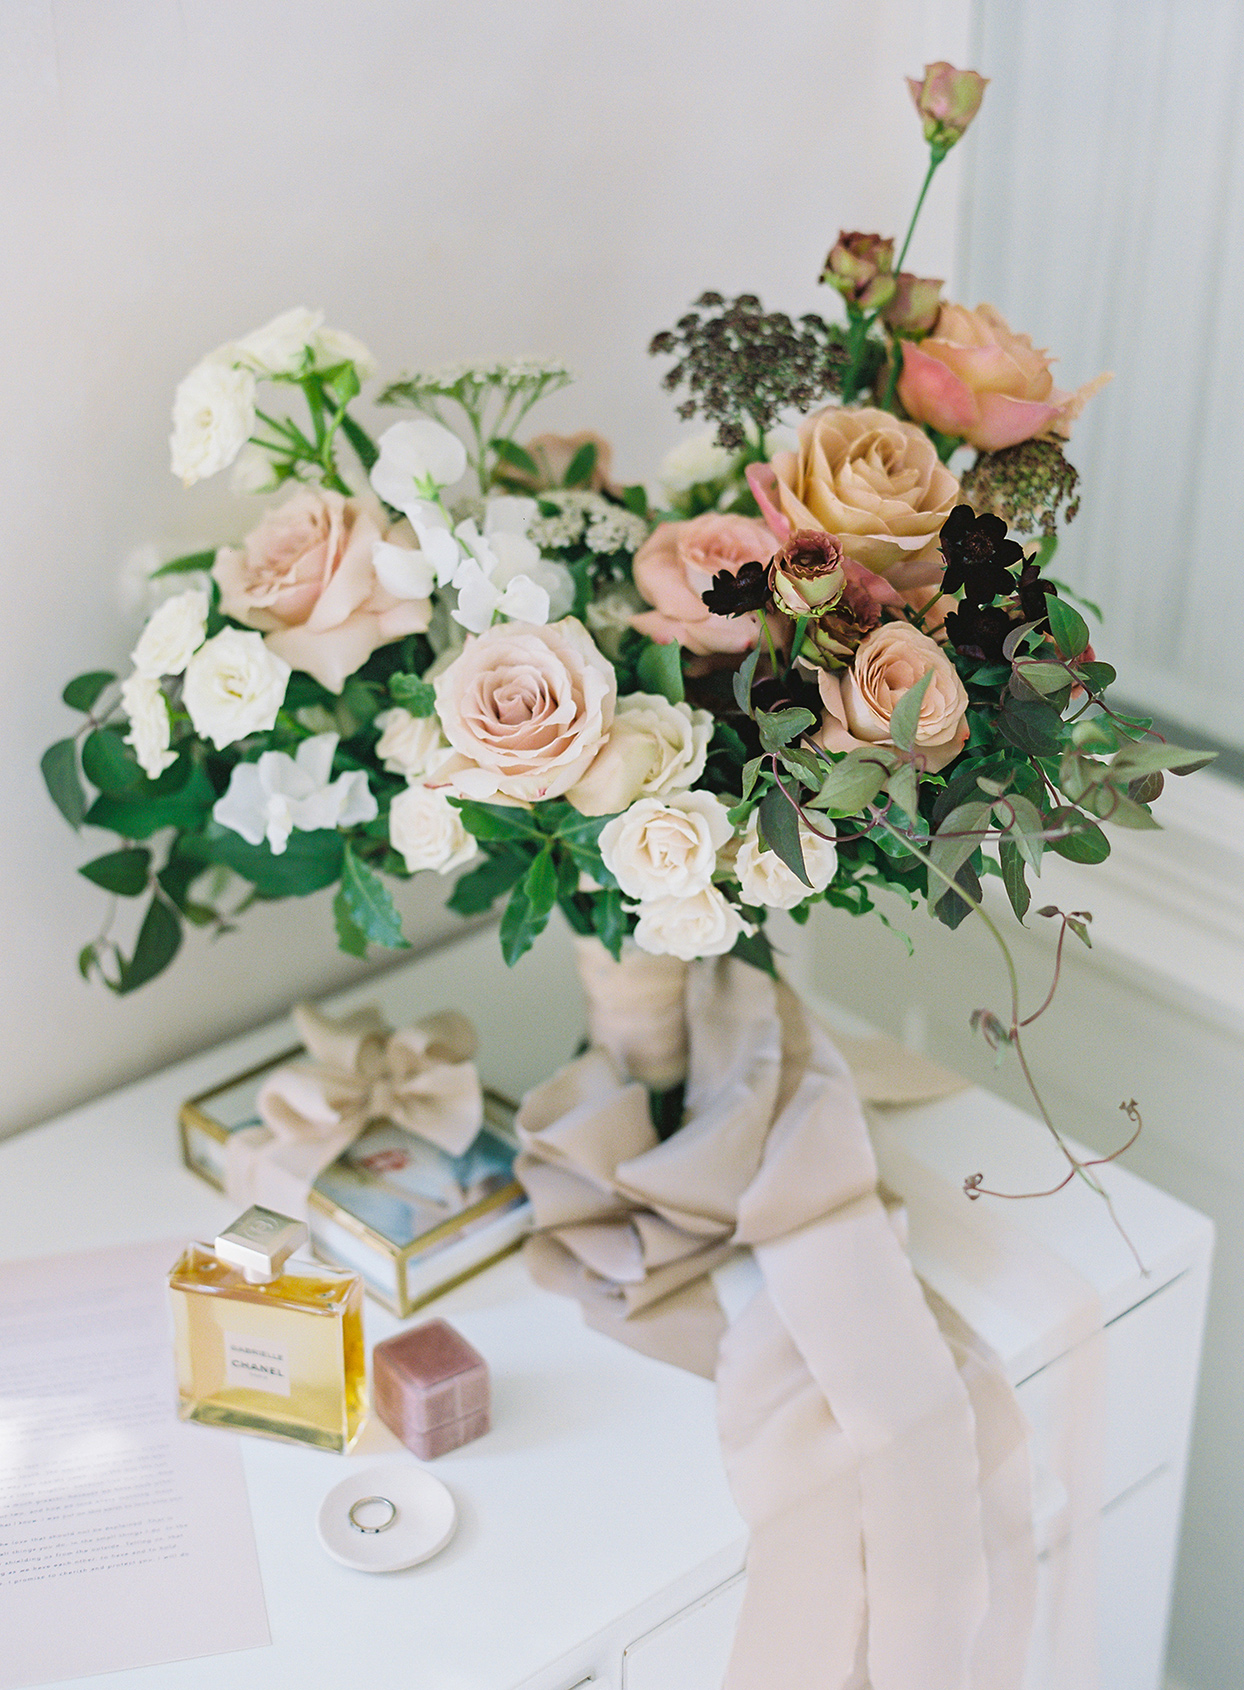 laura alexander wedding bouquet neutral pinks